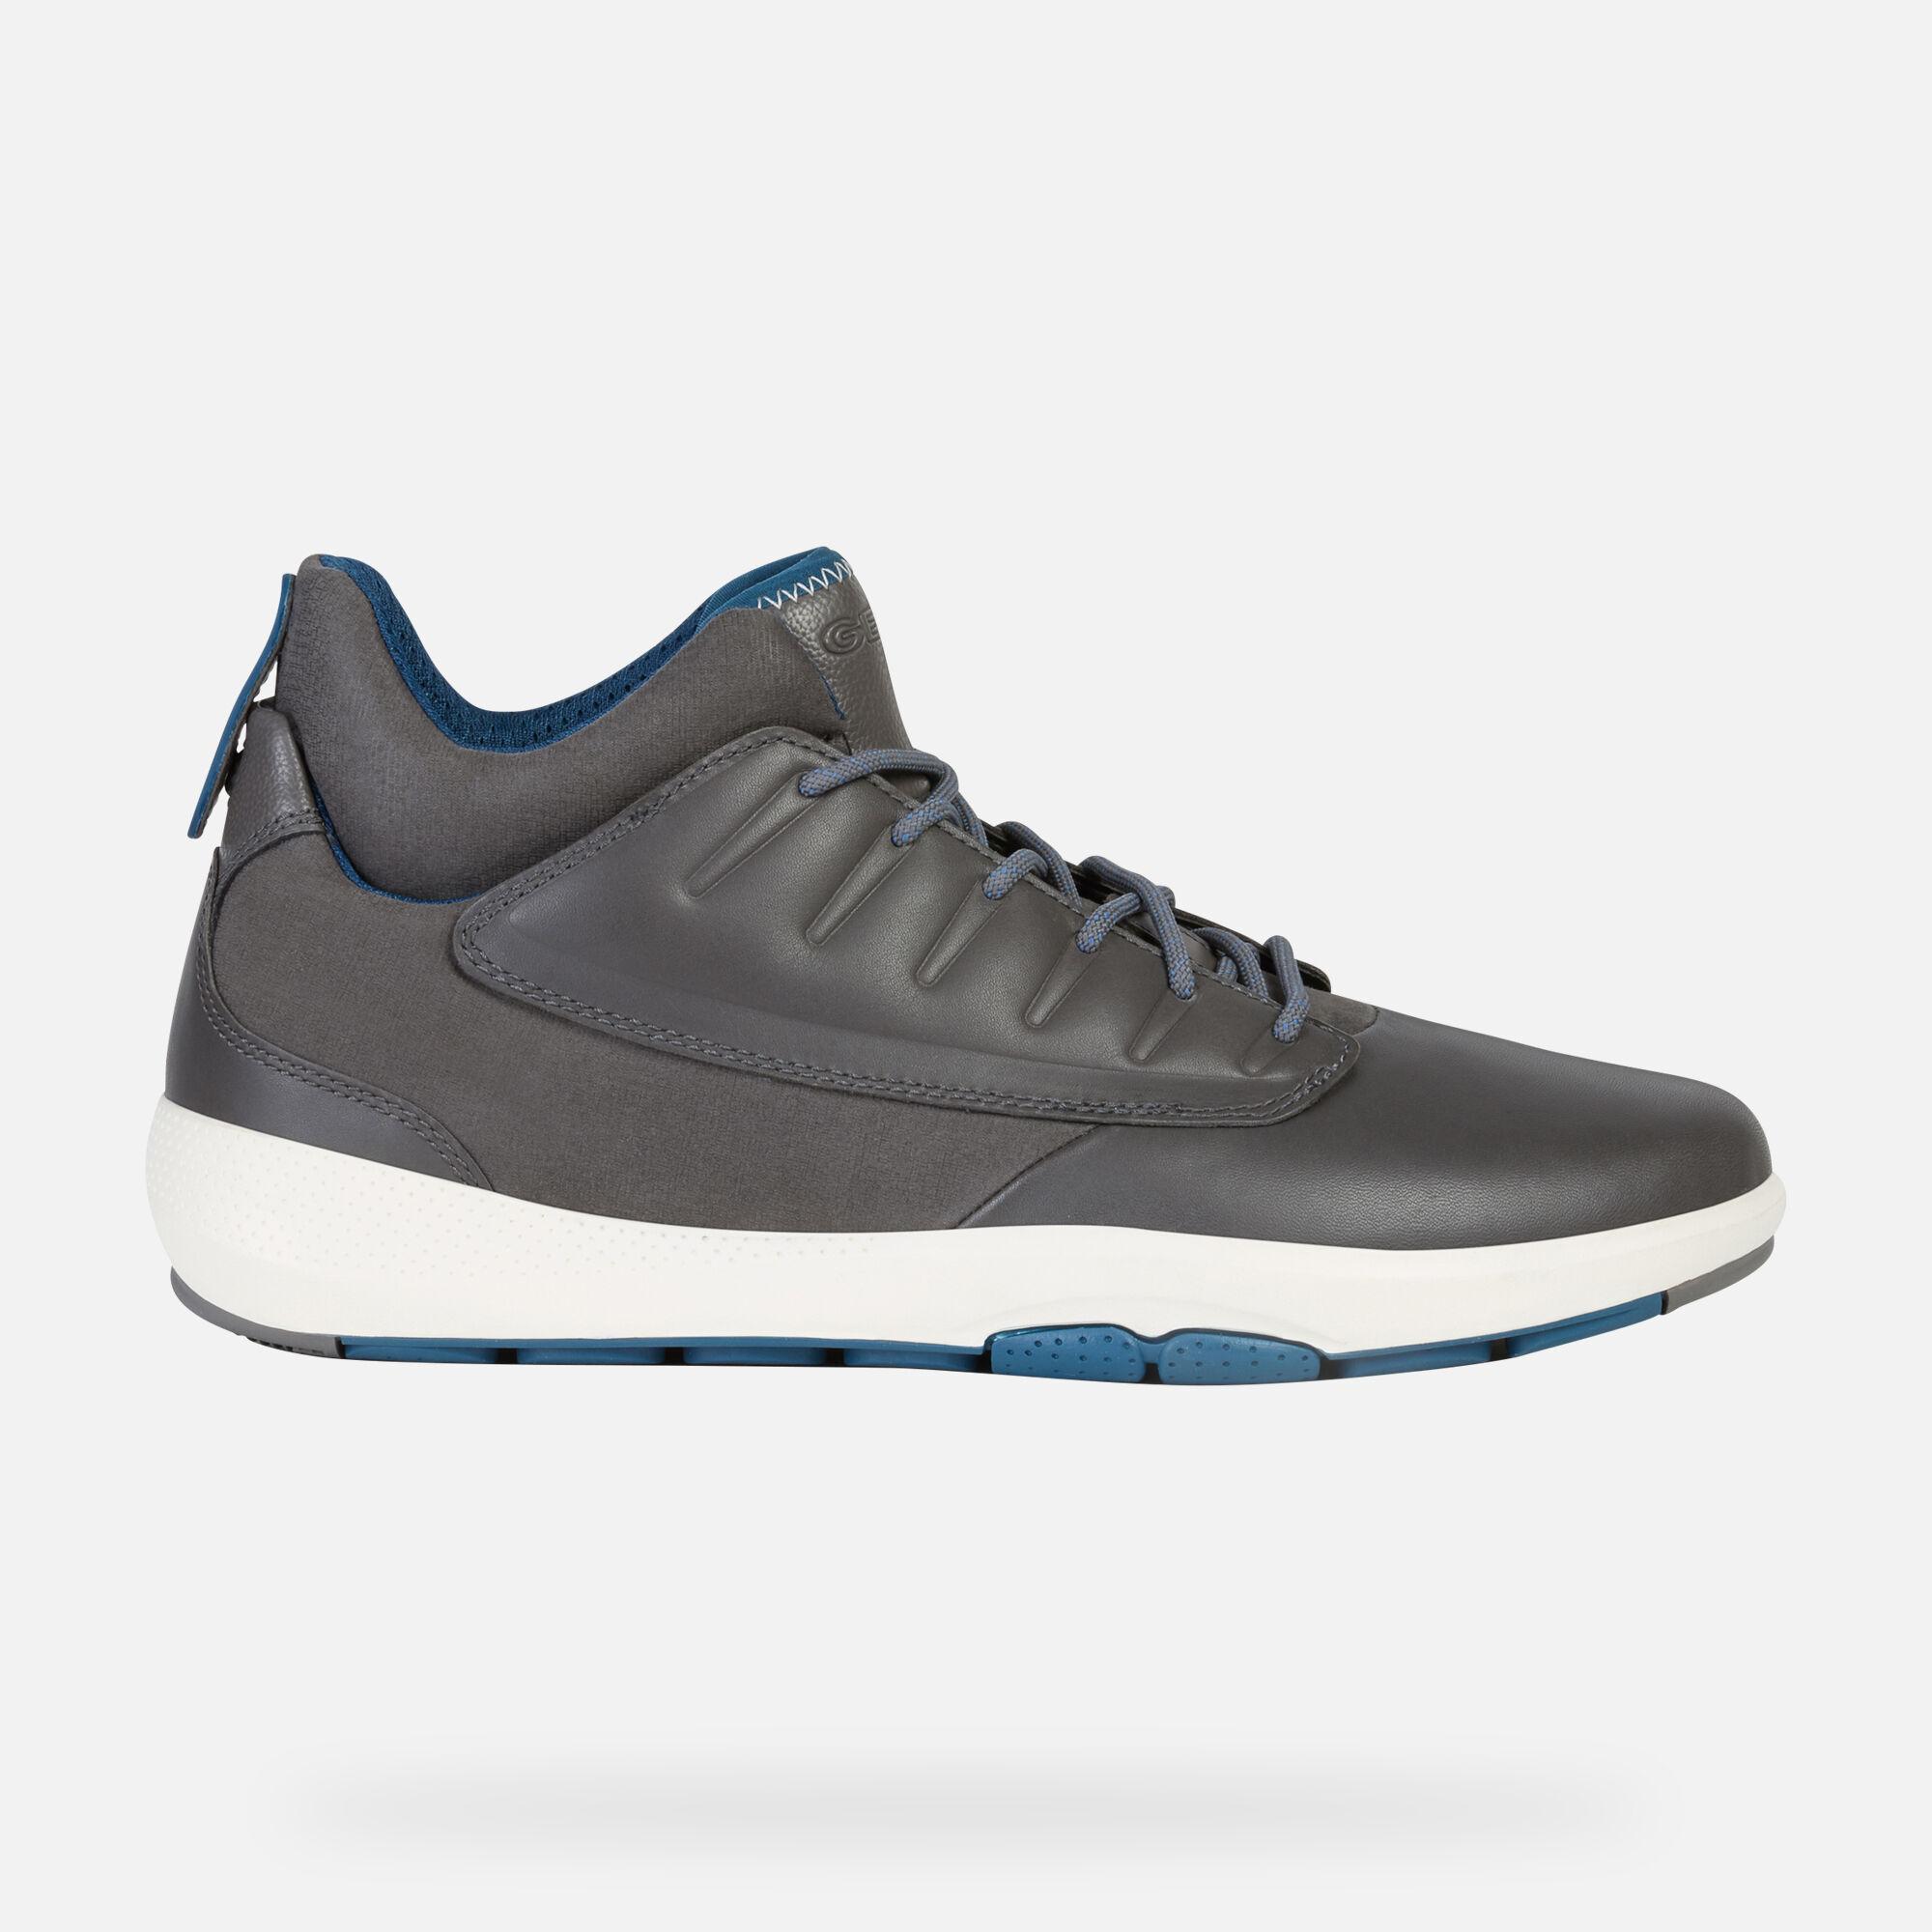 Geox MATTIAS ABX Sneakers Basse Nere Uomo | Geox Autunno Inverno